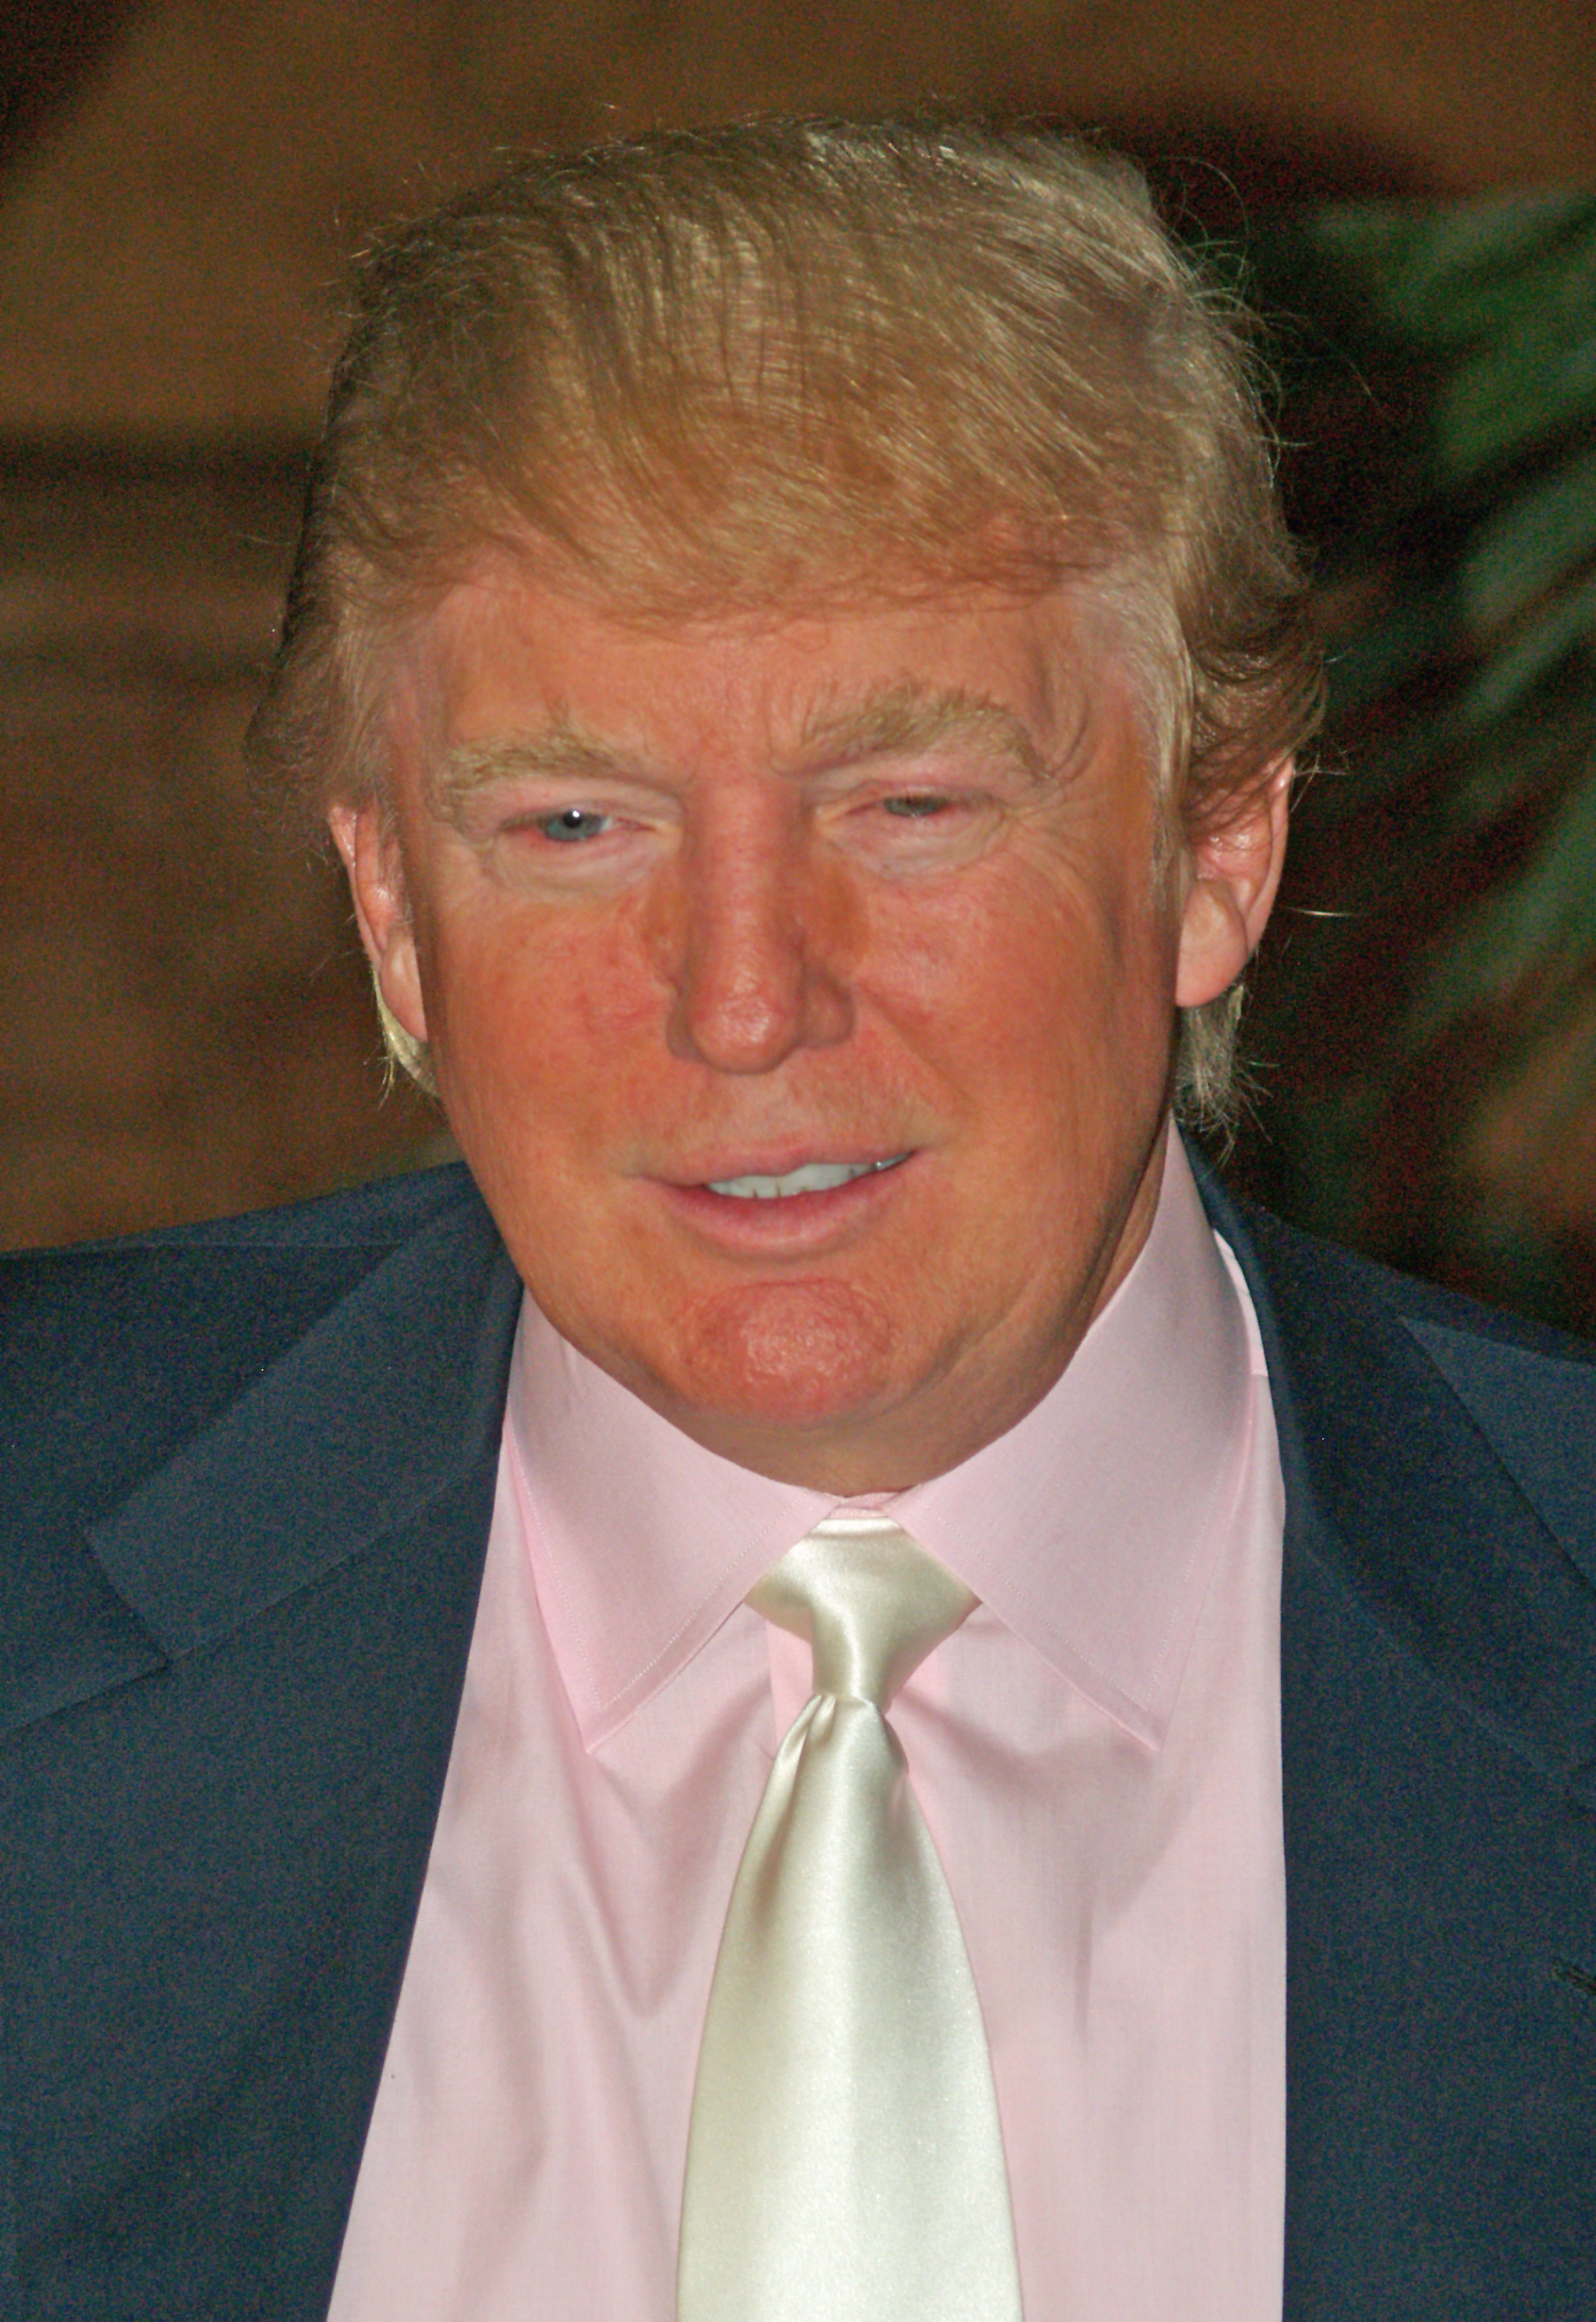 Donald Trump Simple English The Free Encyclopedia